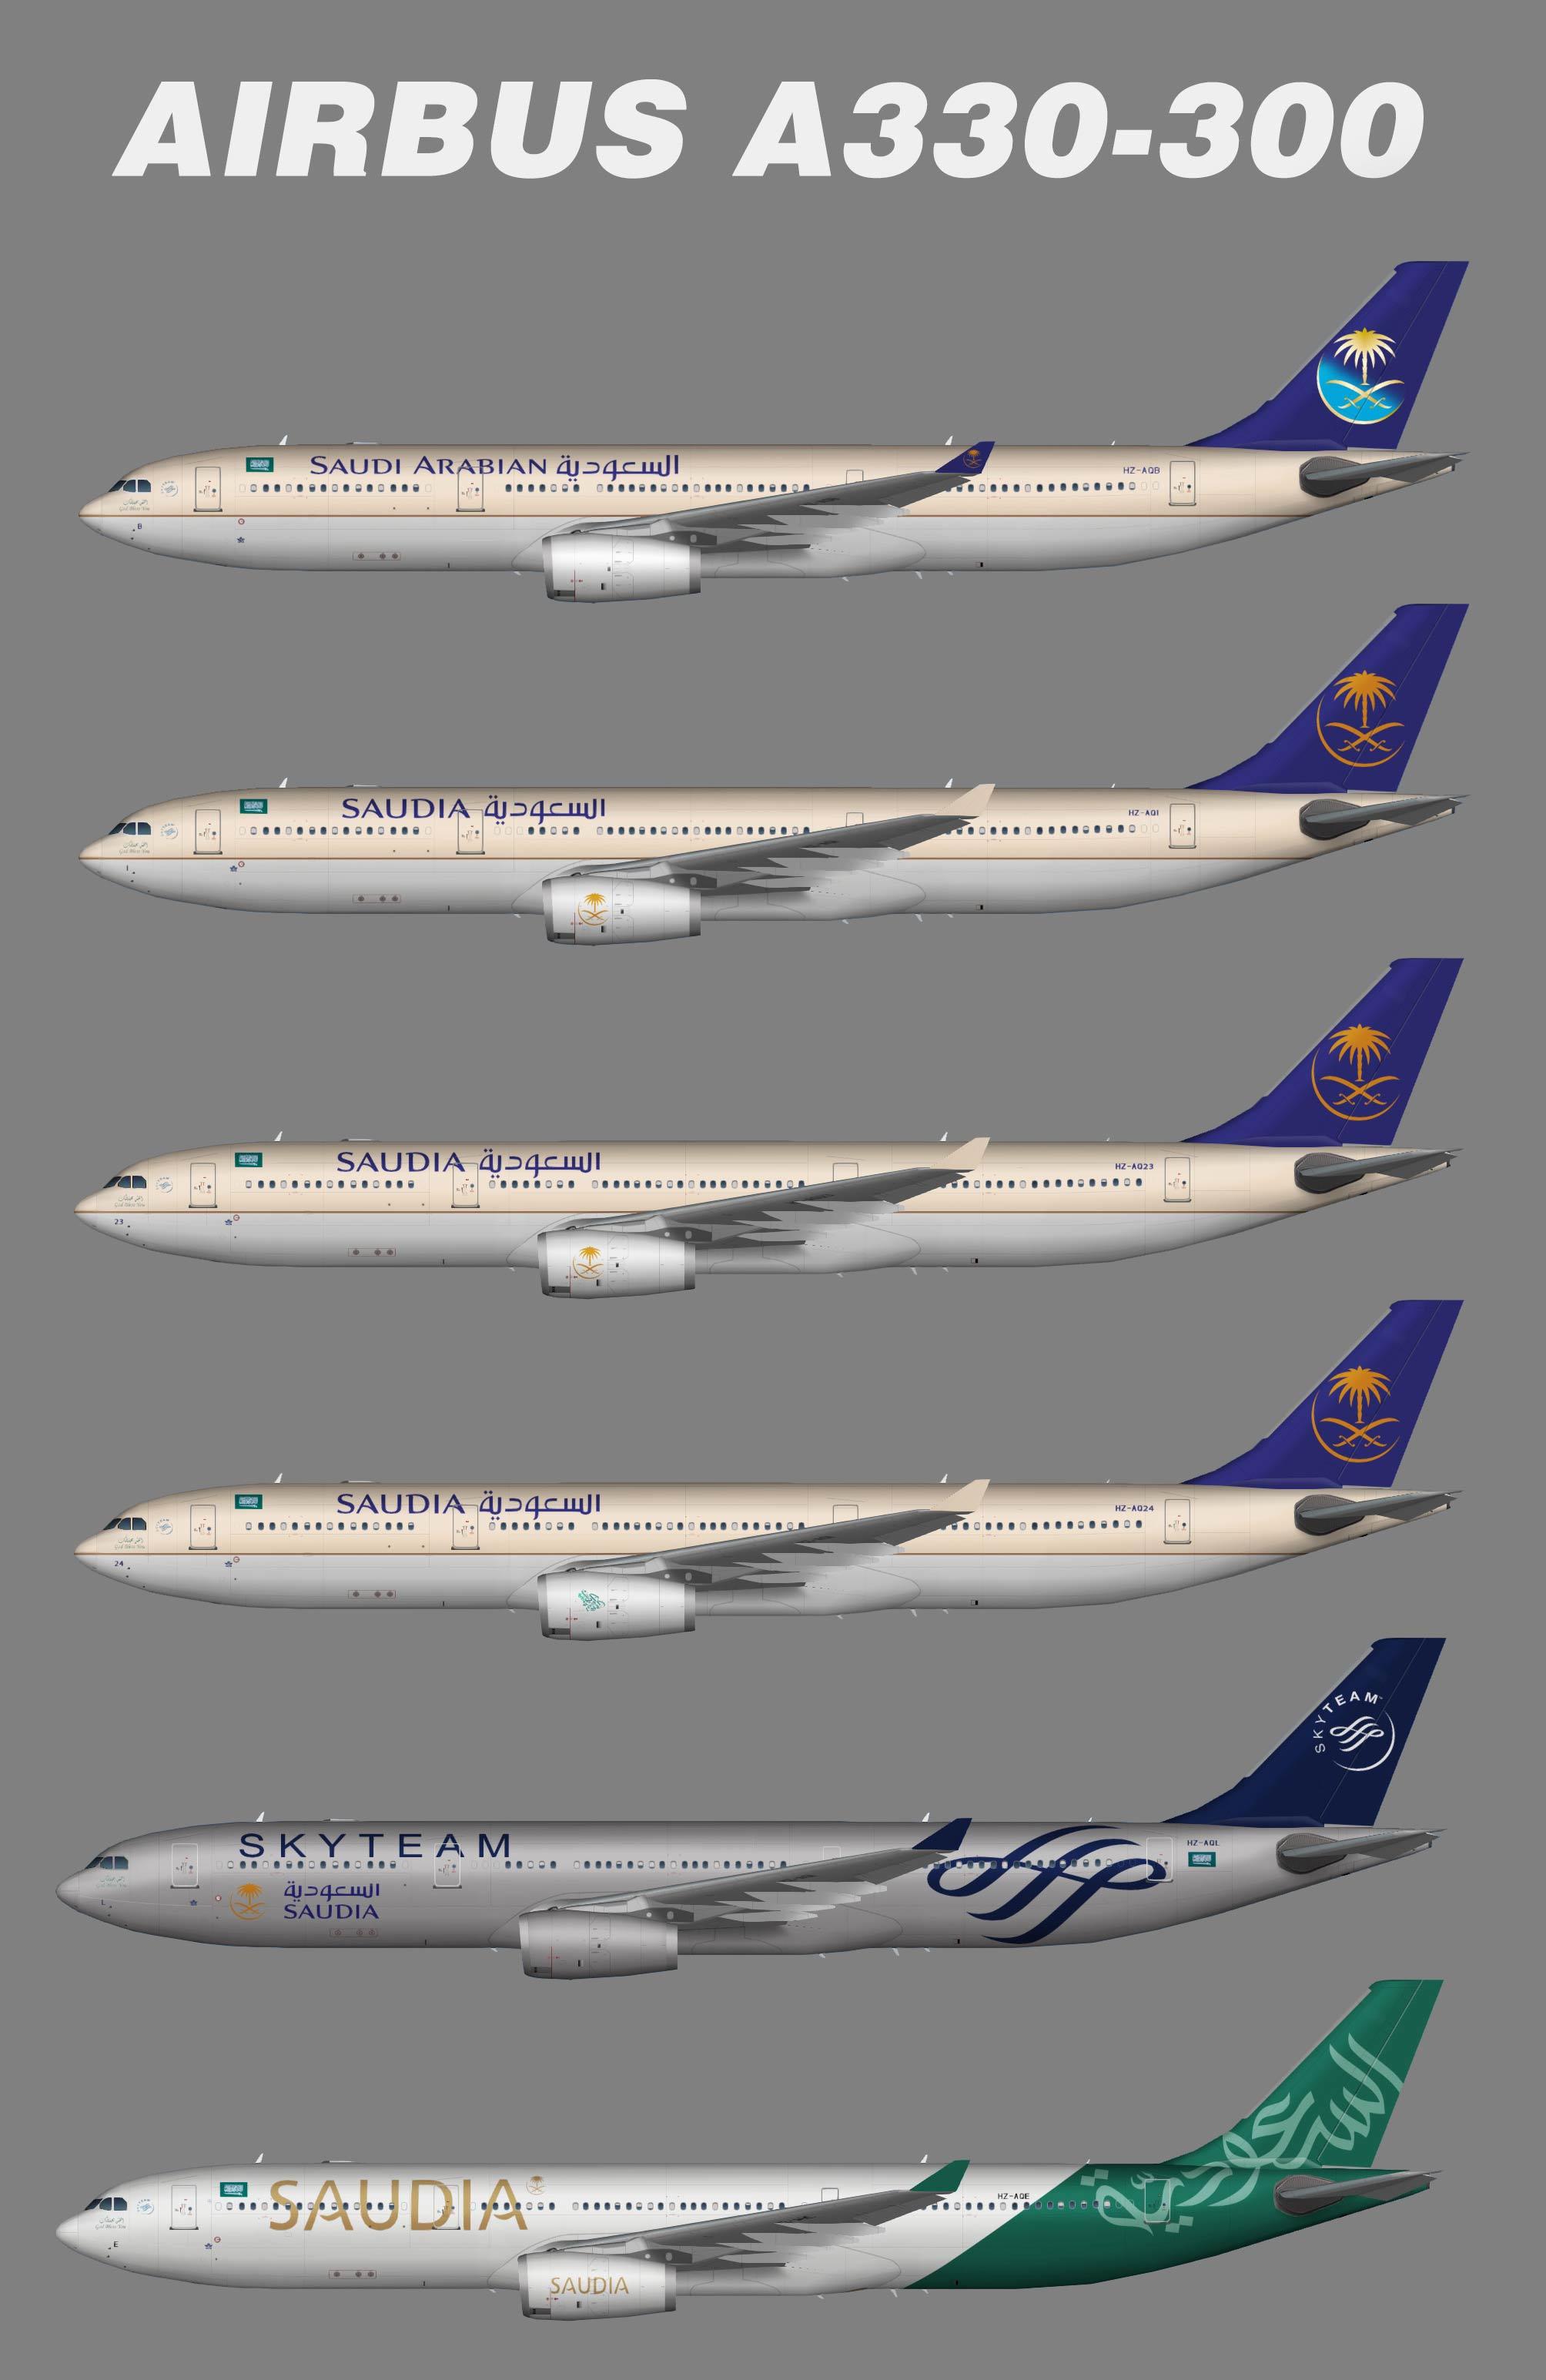 Saudia Airbus A330-300